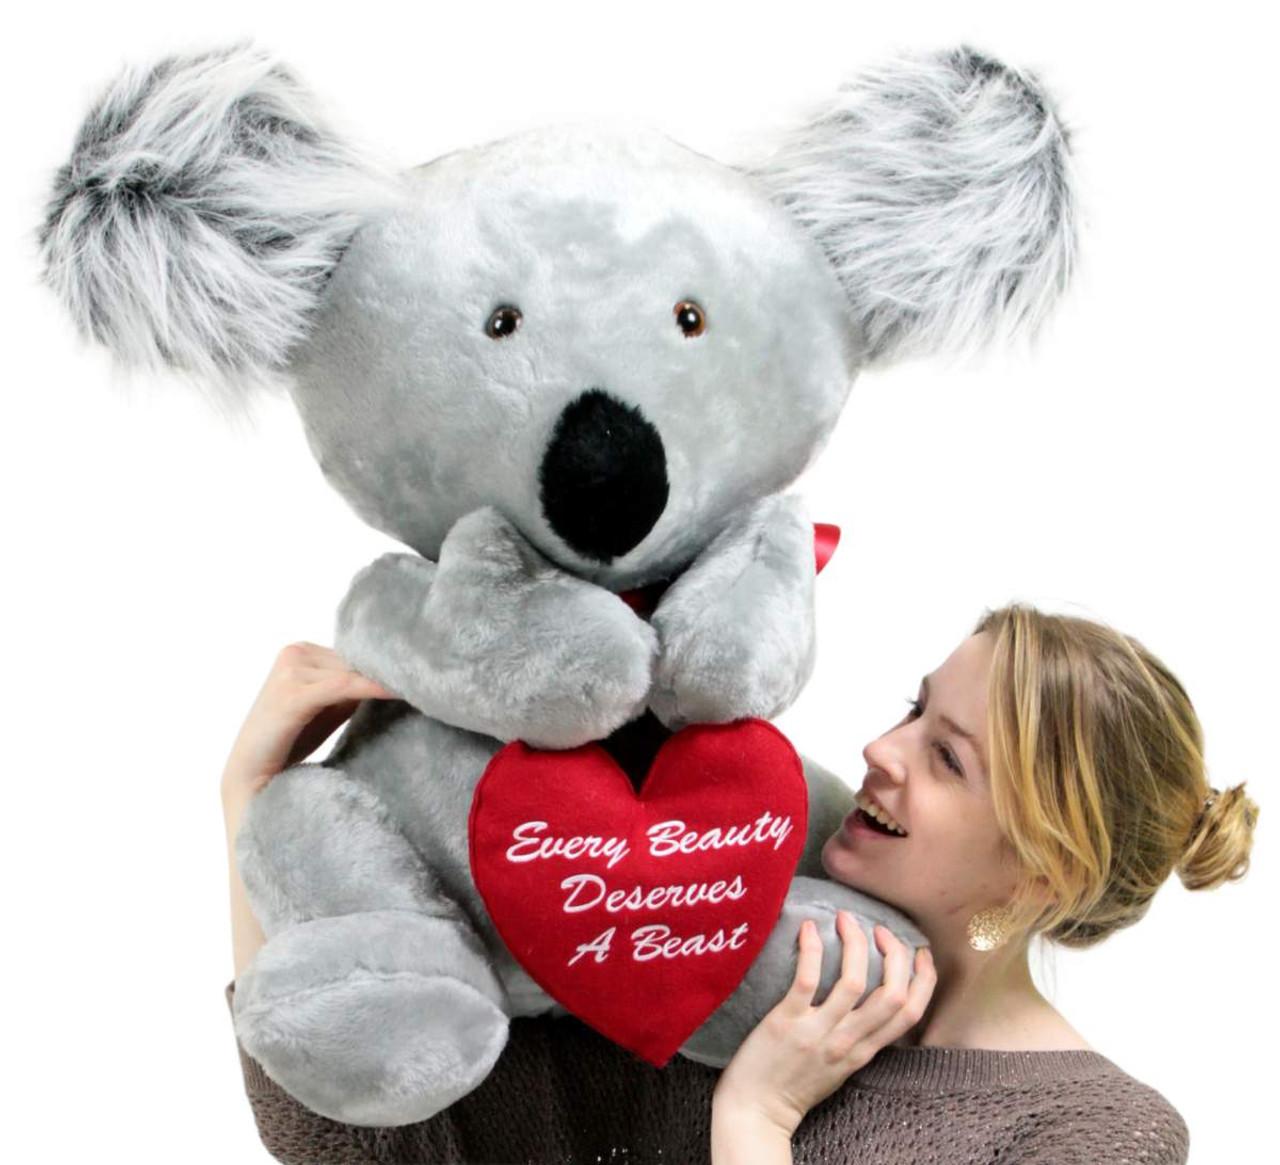 American Made Romantic Large Stuffed Koala 26 Inch Soft Holds Heart